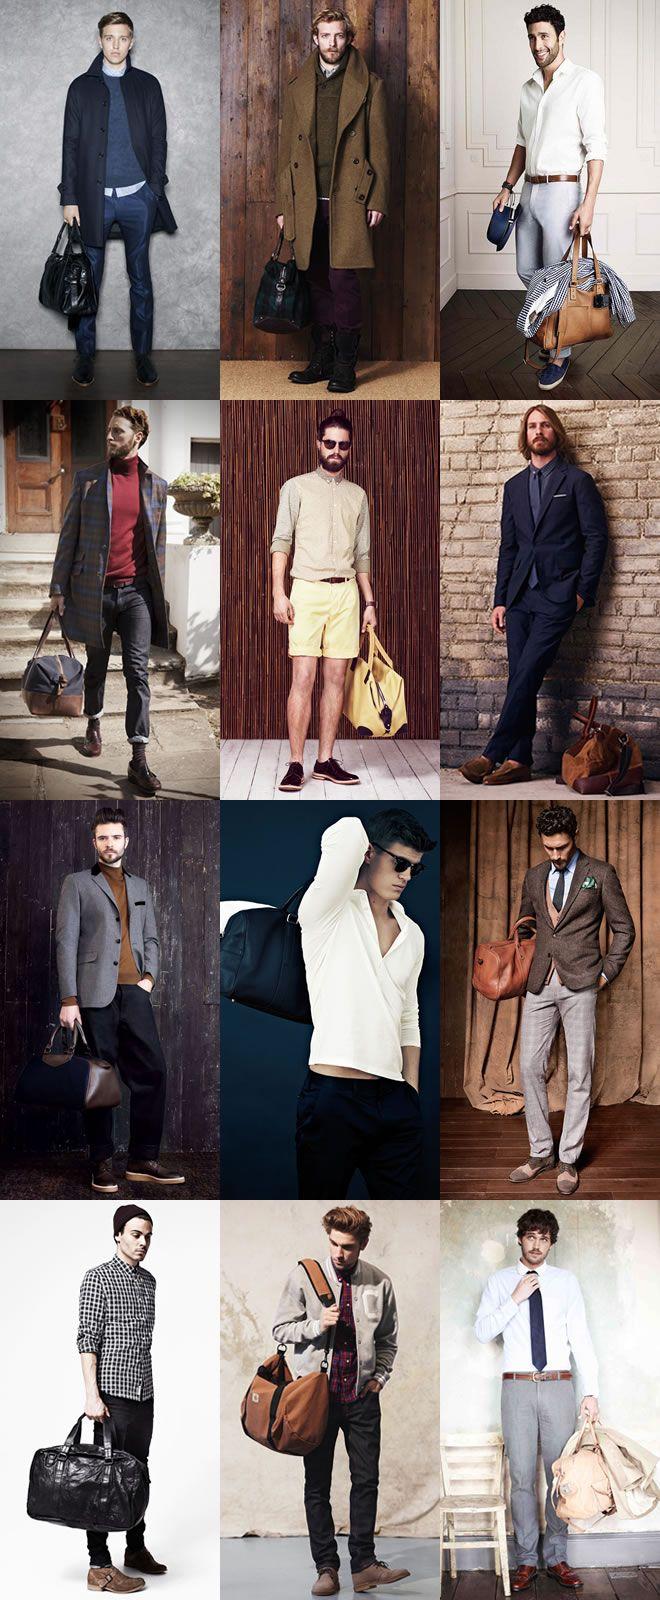 Men's Duffle Bag and Holdall LookbookDufflelookbook Jpg 660 1600, Mens Holdall, Men Style, Men Holdall Duffel, Men Fashion, Holdall Lookbook, Men'S Fashion, Men Duffle, Mensfashion Lookbook